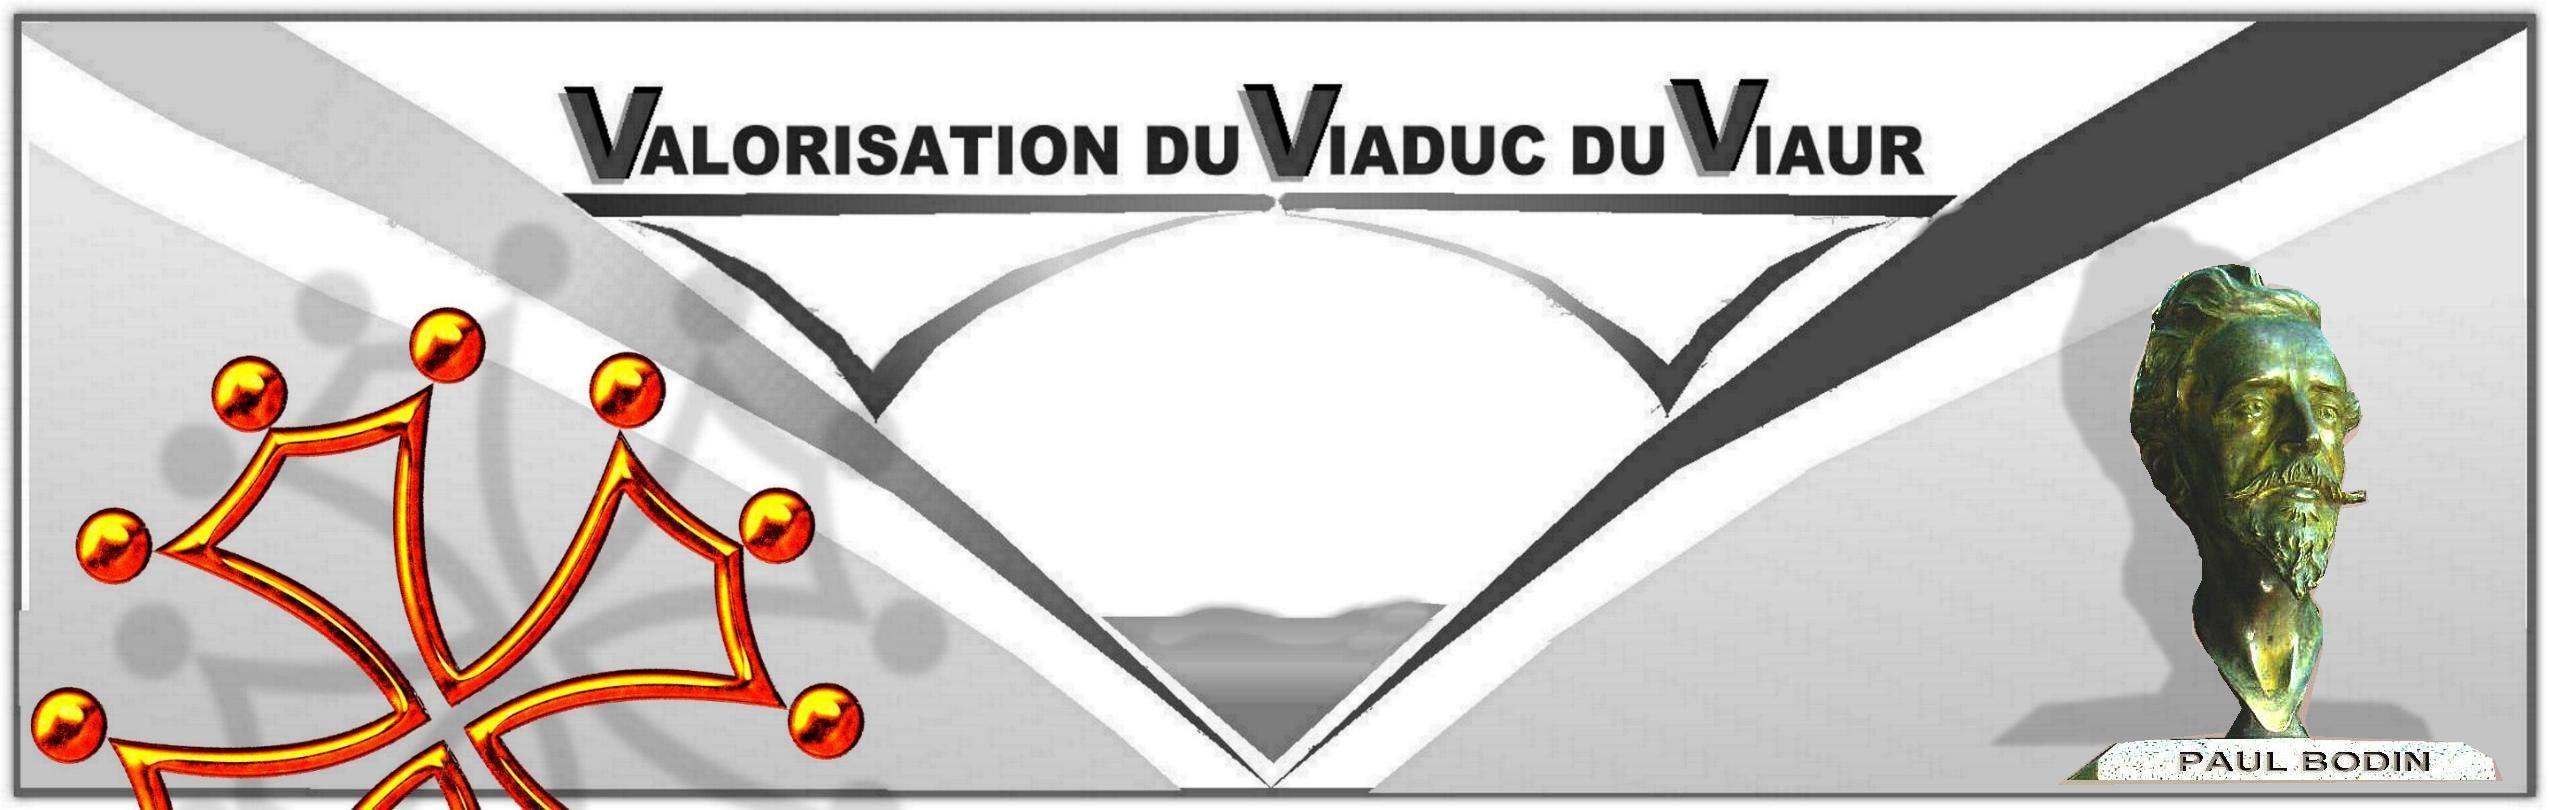 ASSOCIATION VALORISATION DU VIADUC DU VIAUR